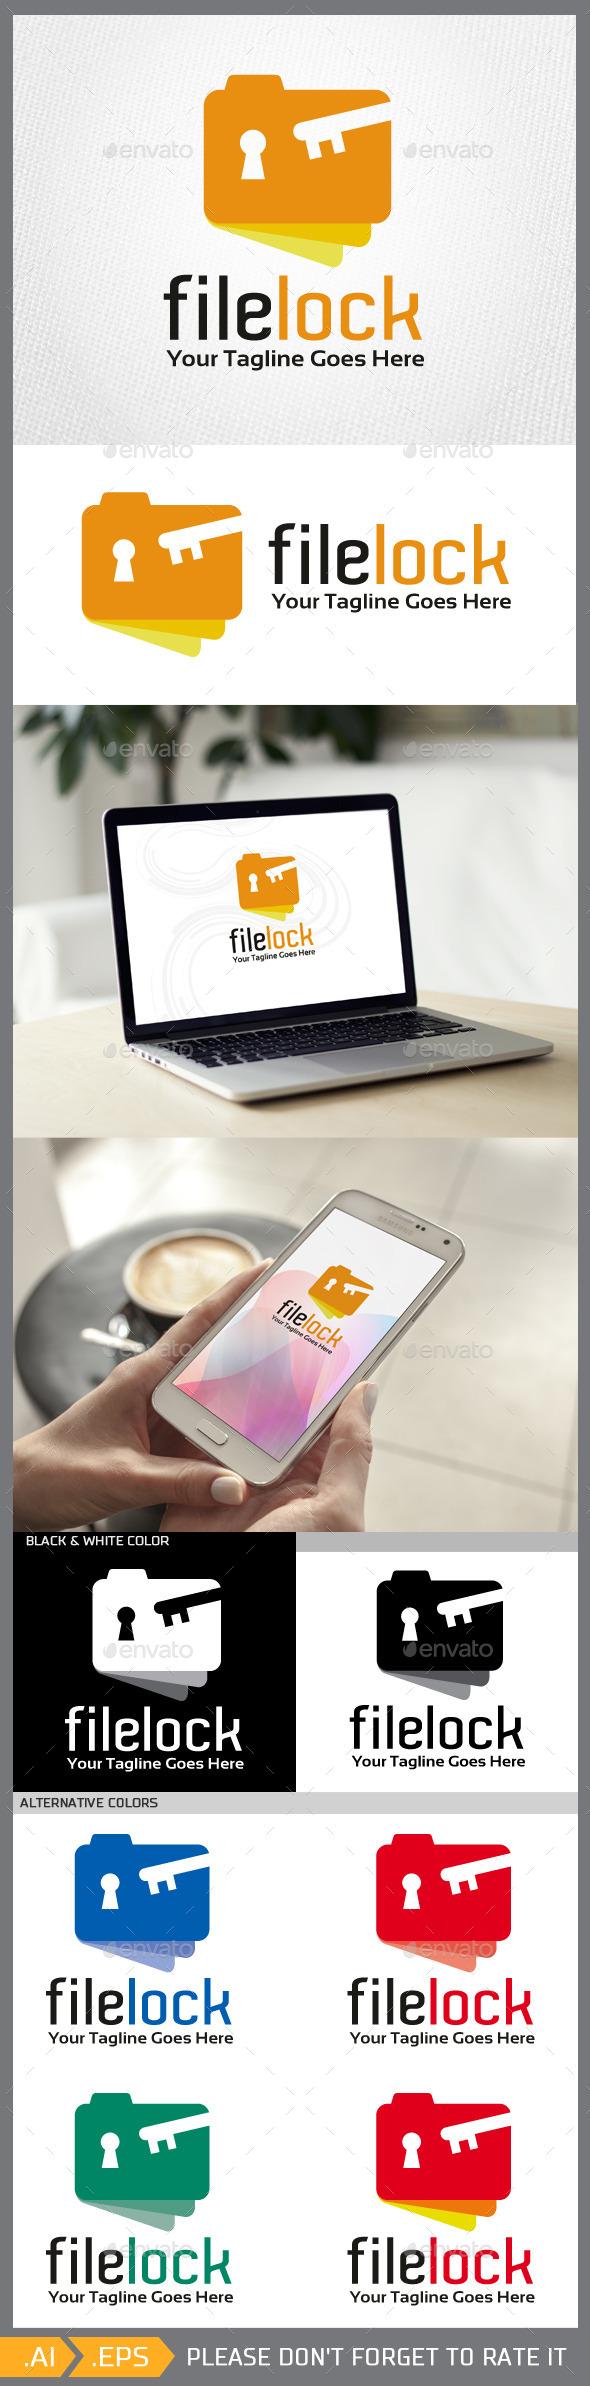 Filelock logo template - Objects Logo Templates